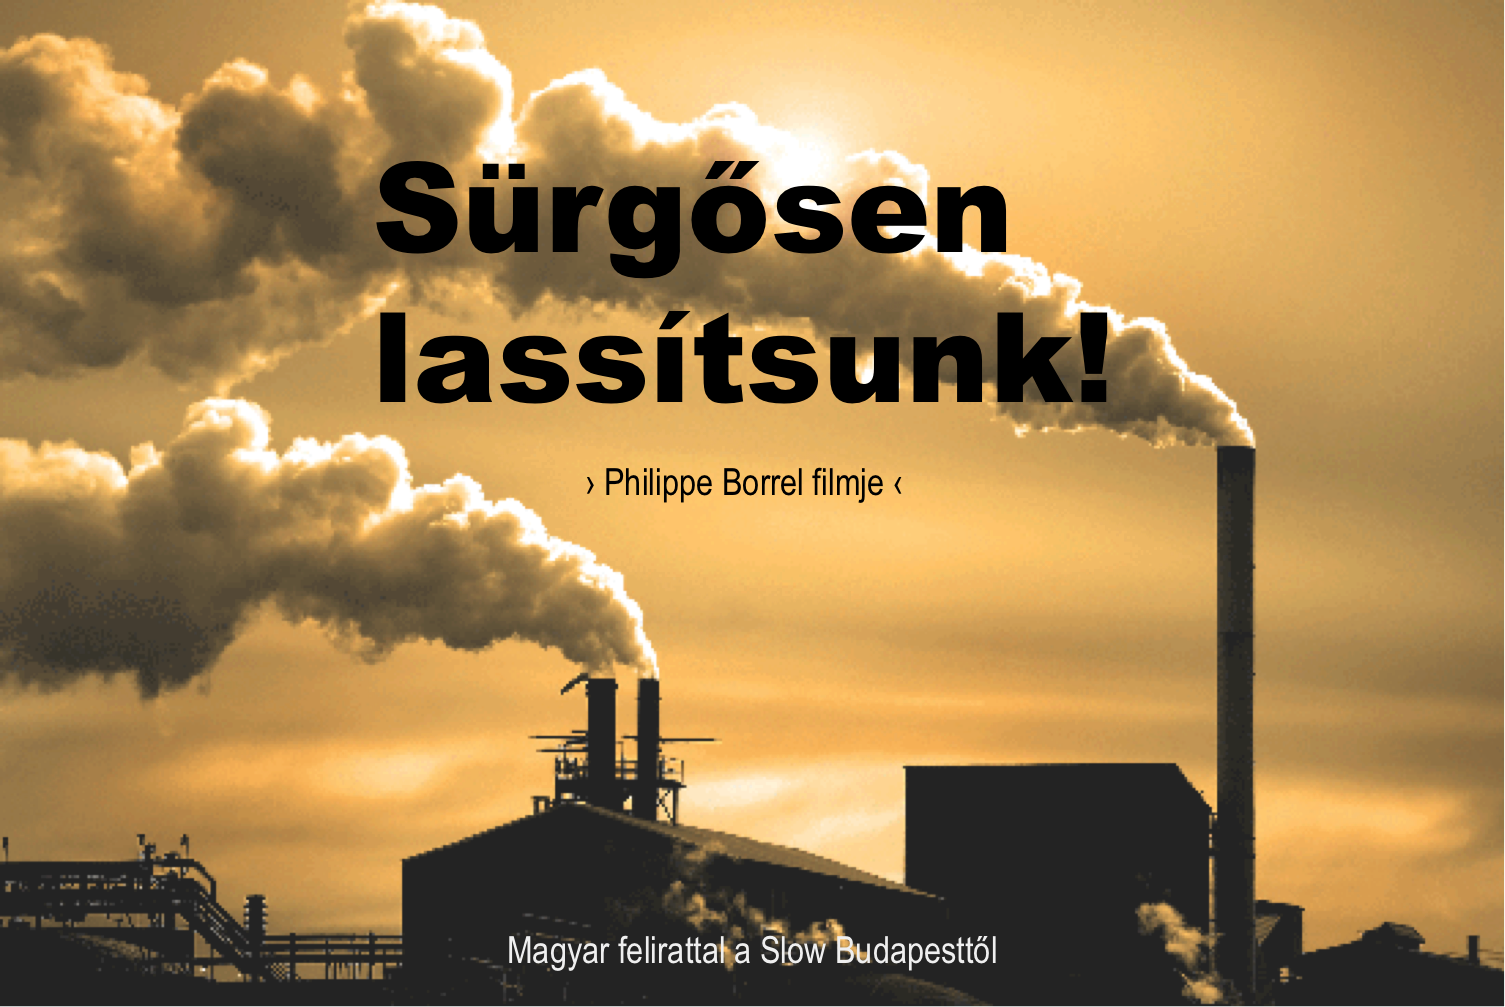 surgosen_lassitsunk.png